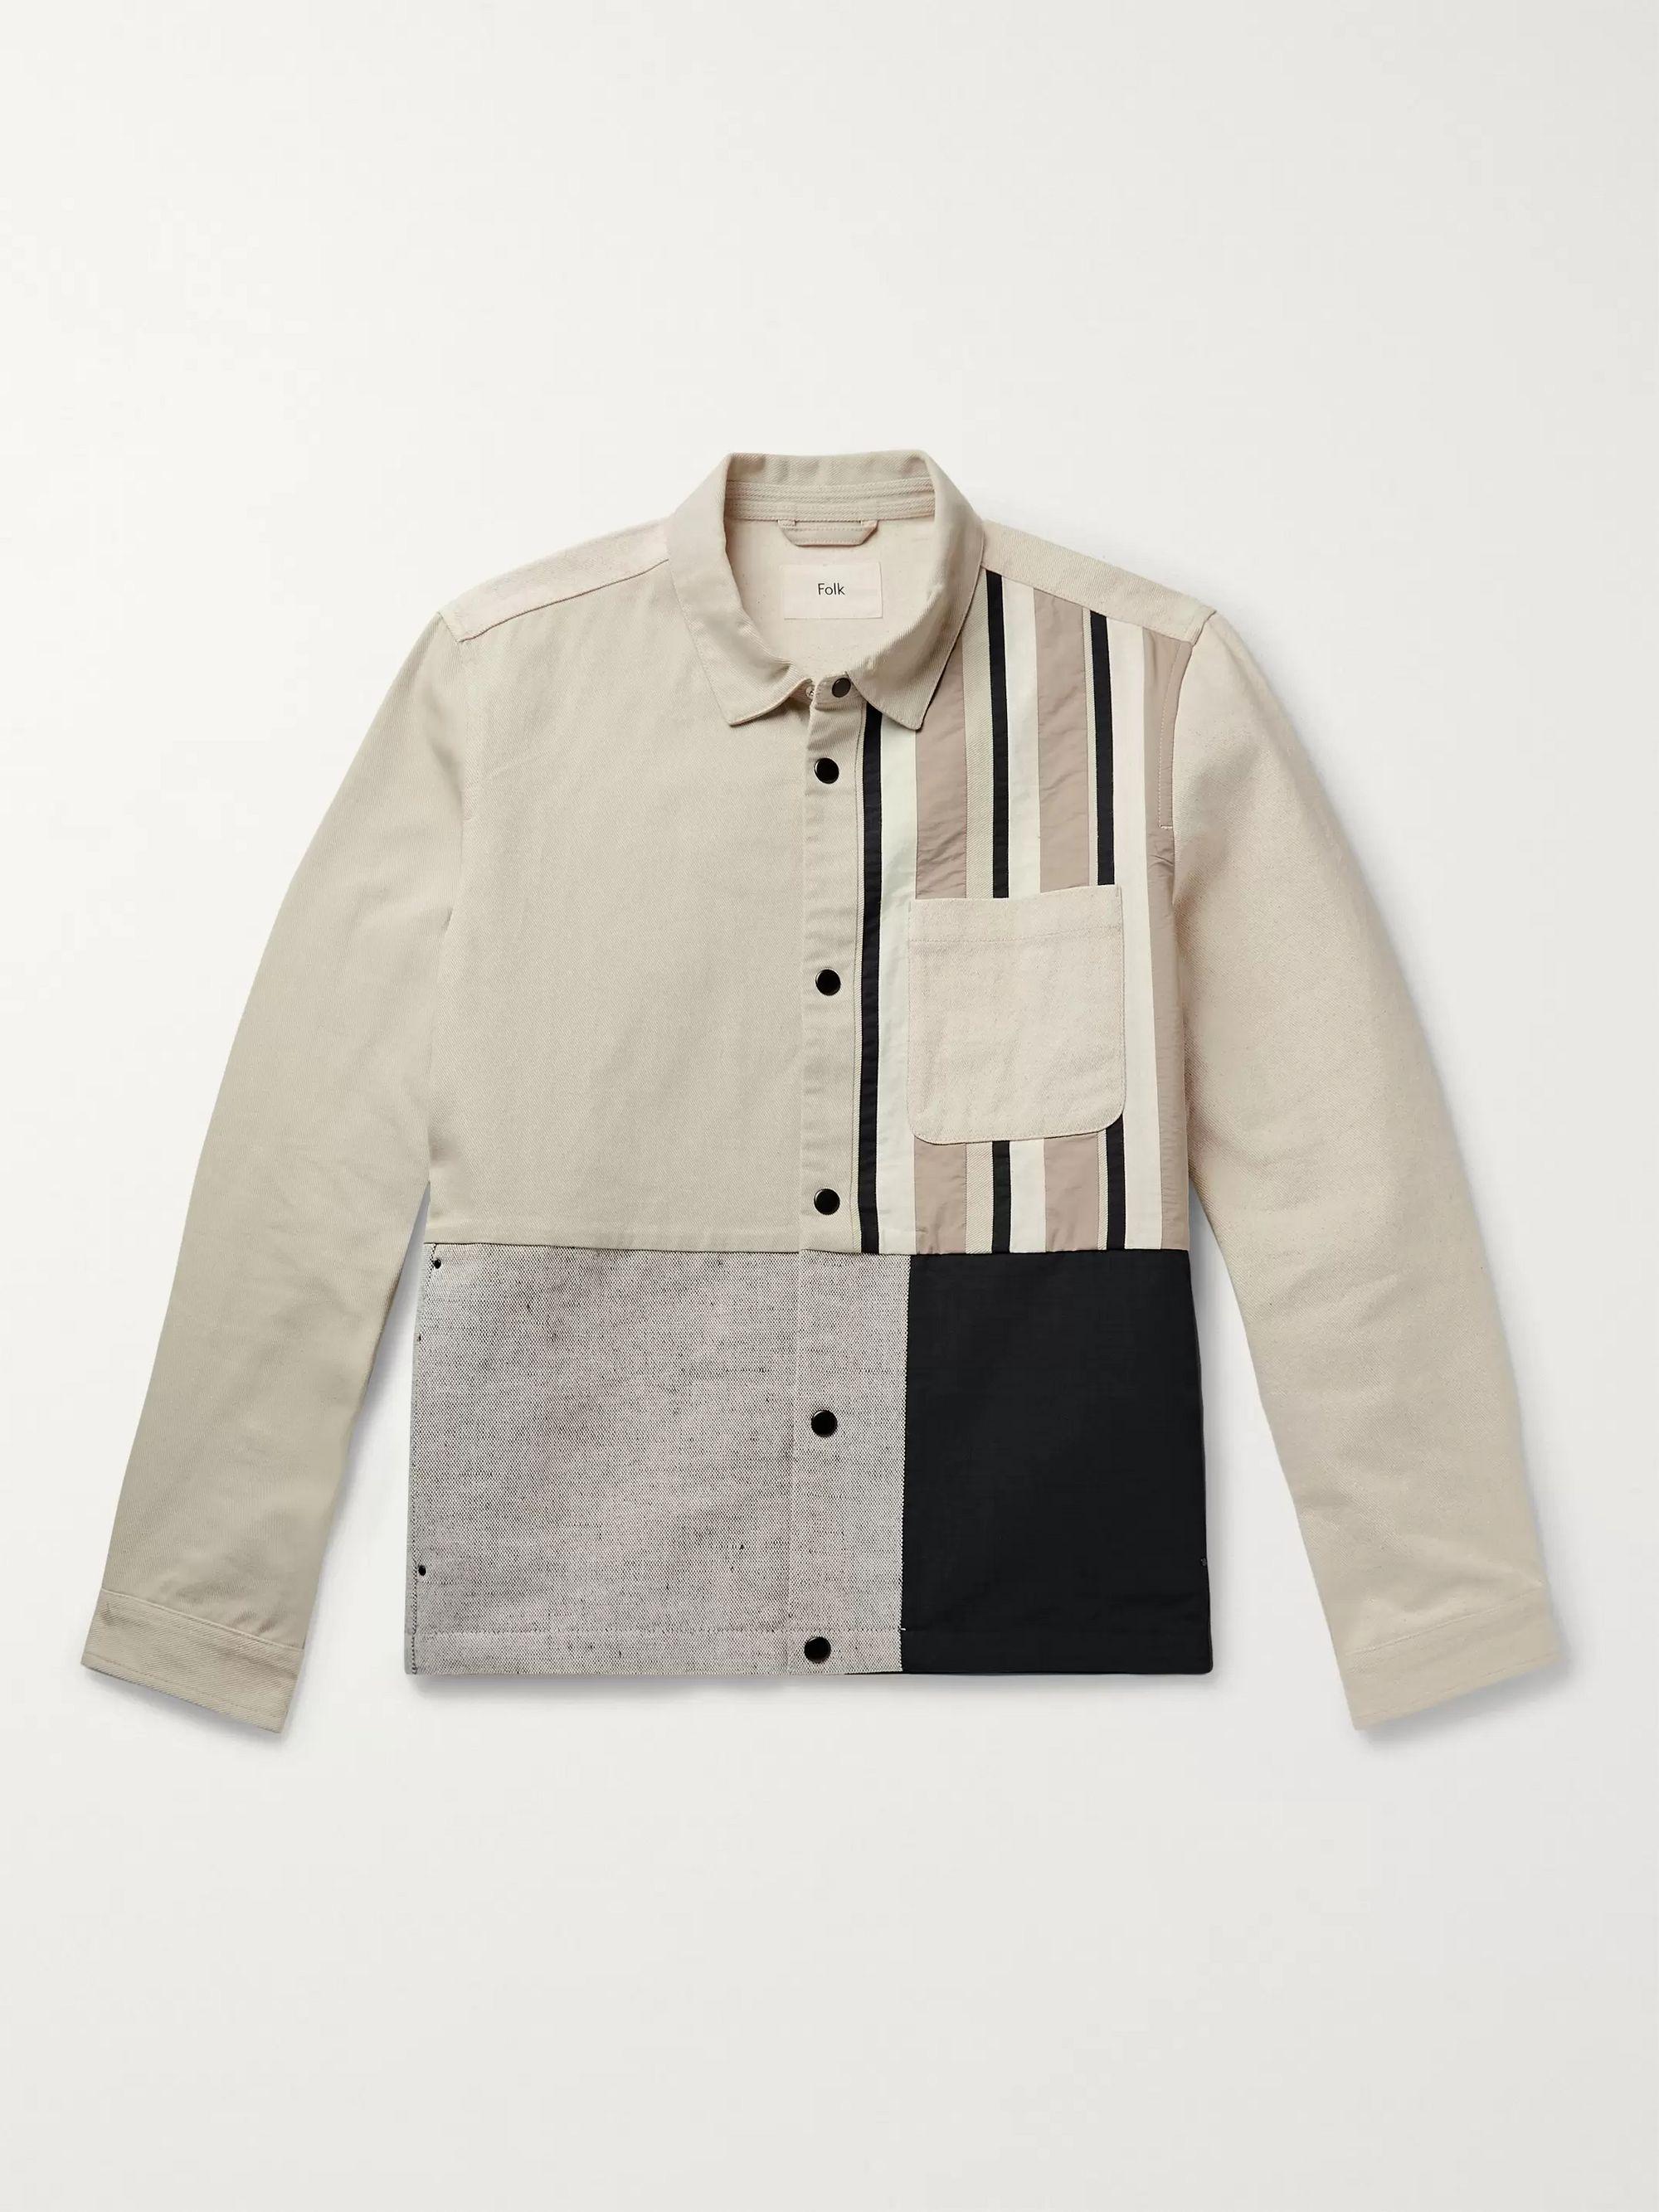 Folk Gray Panelled Cotton-Blend Jacket,Gray